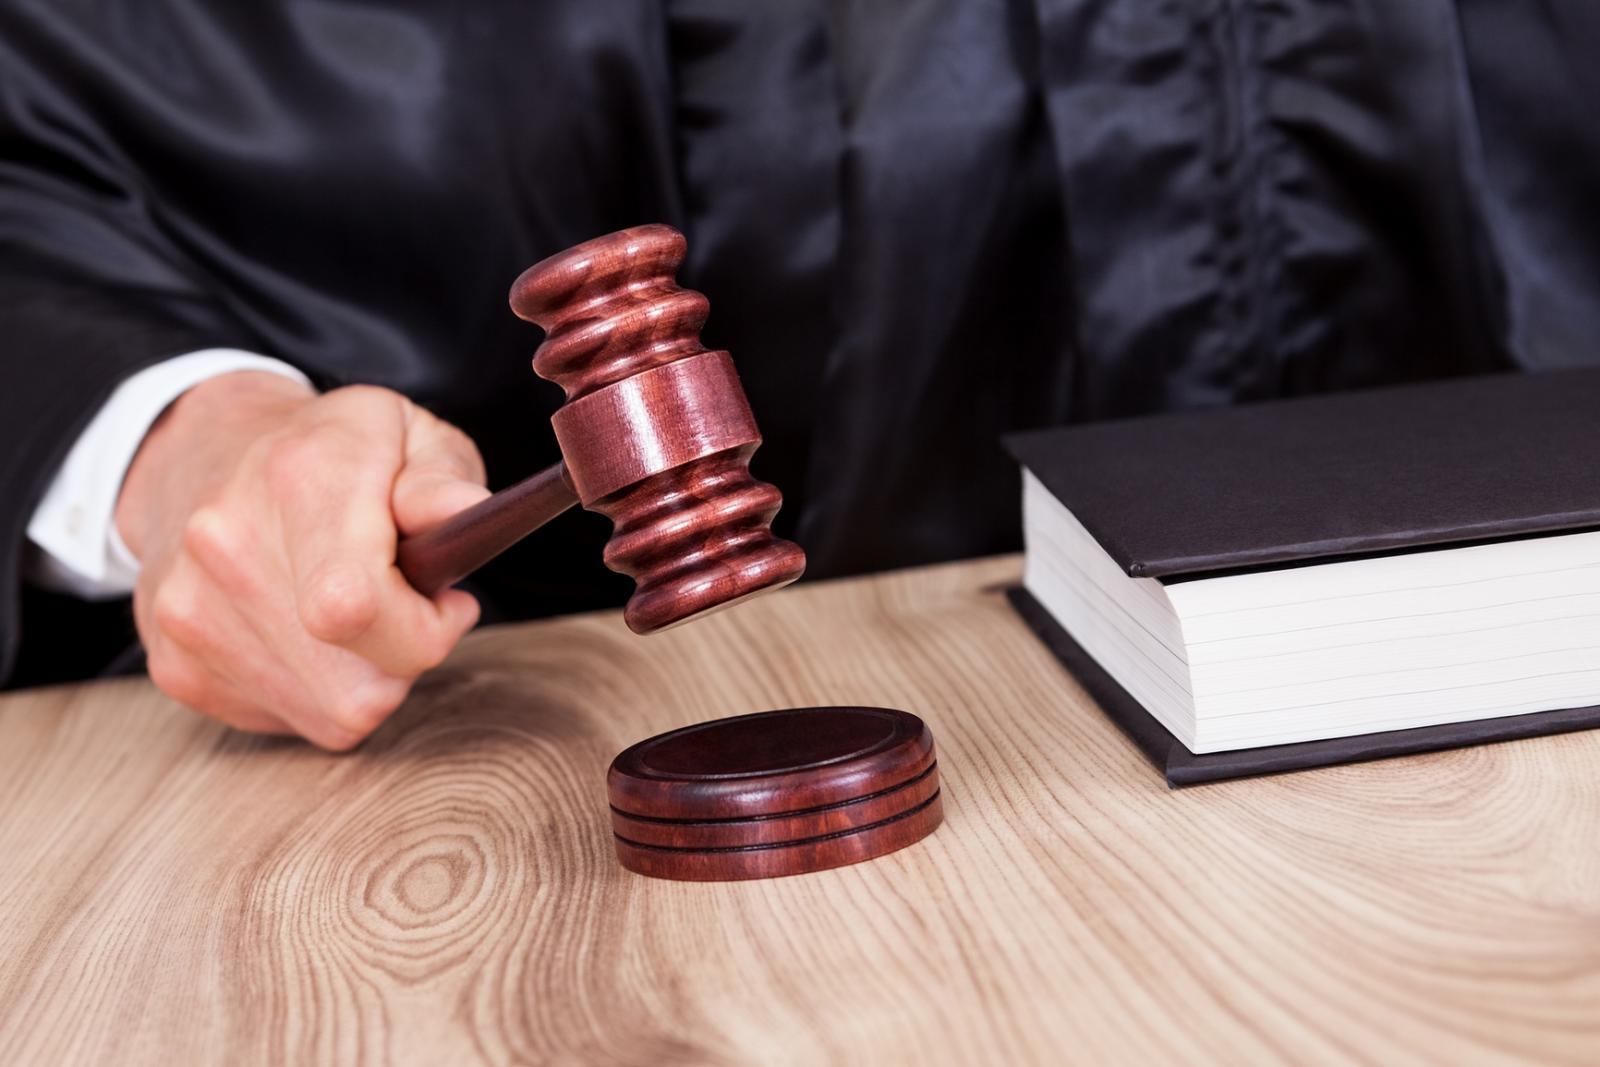 В Брянской области открыта вакансия председателя районного суда